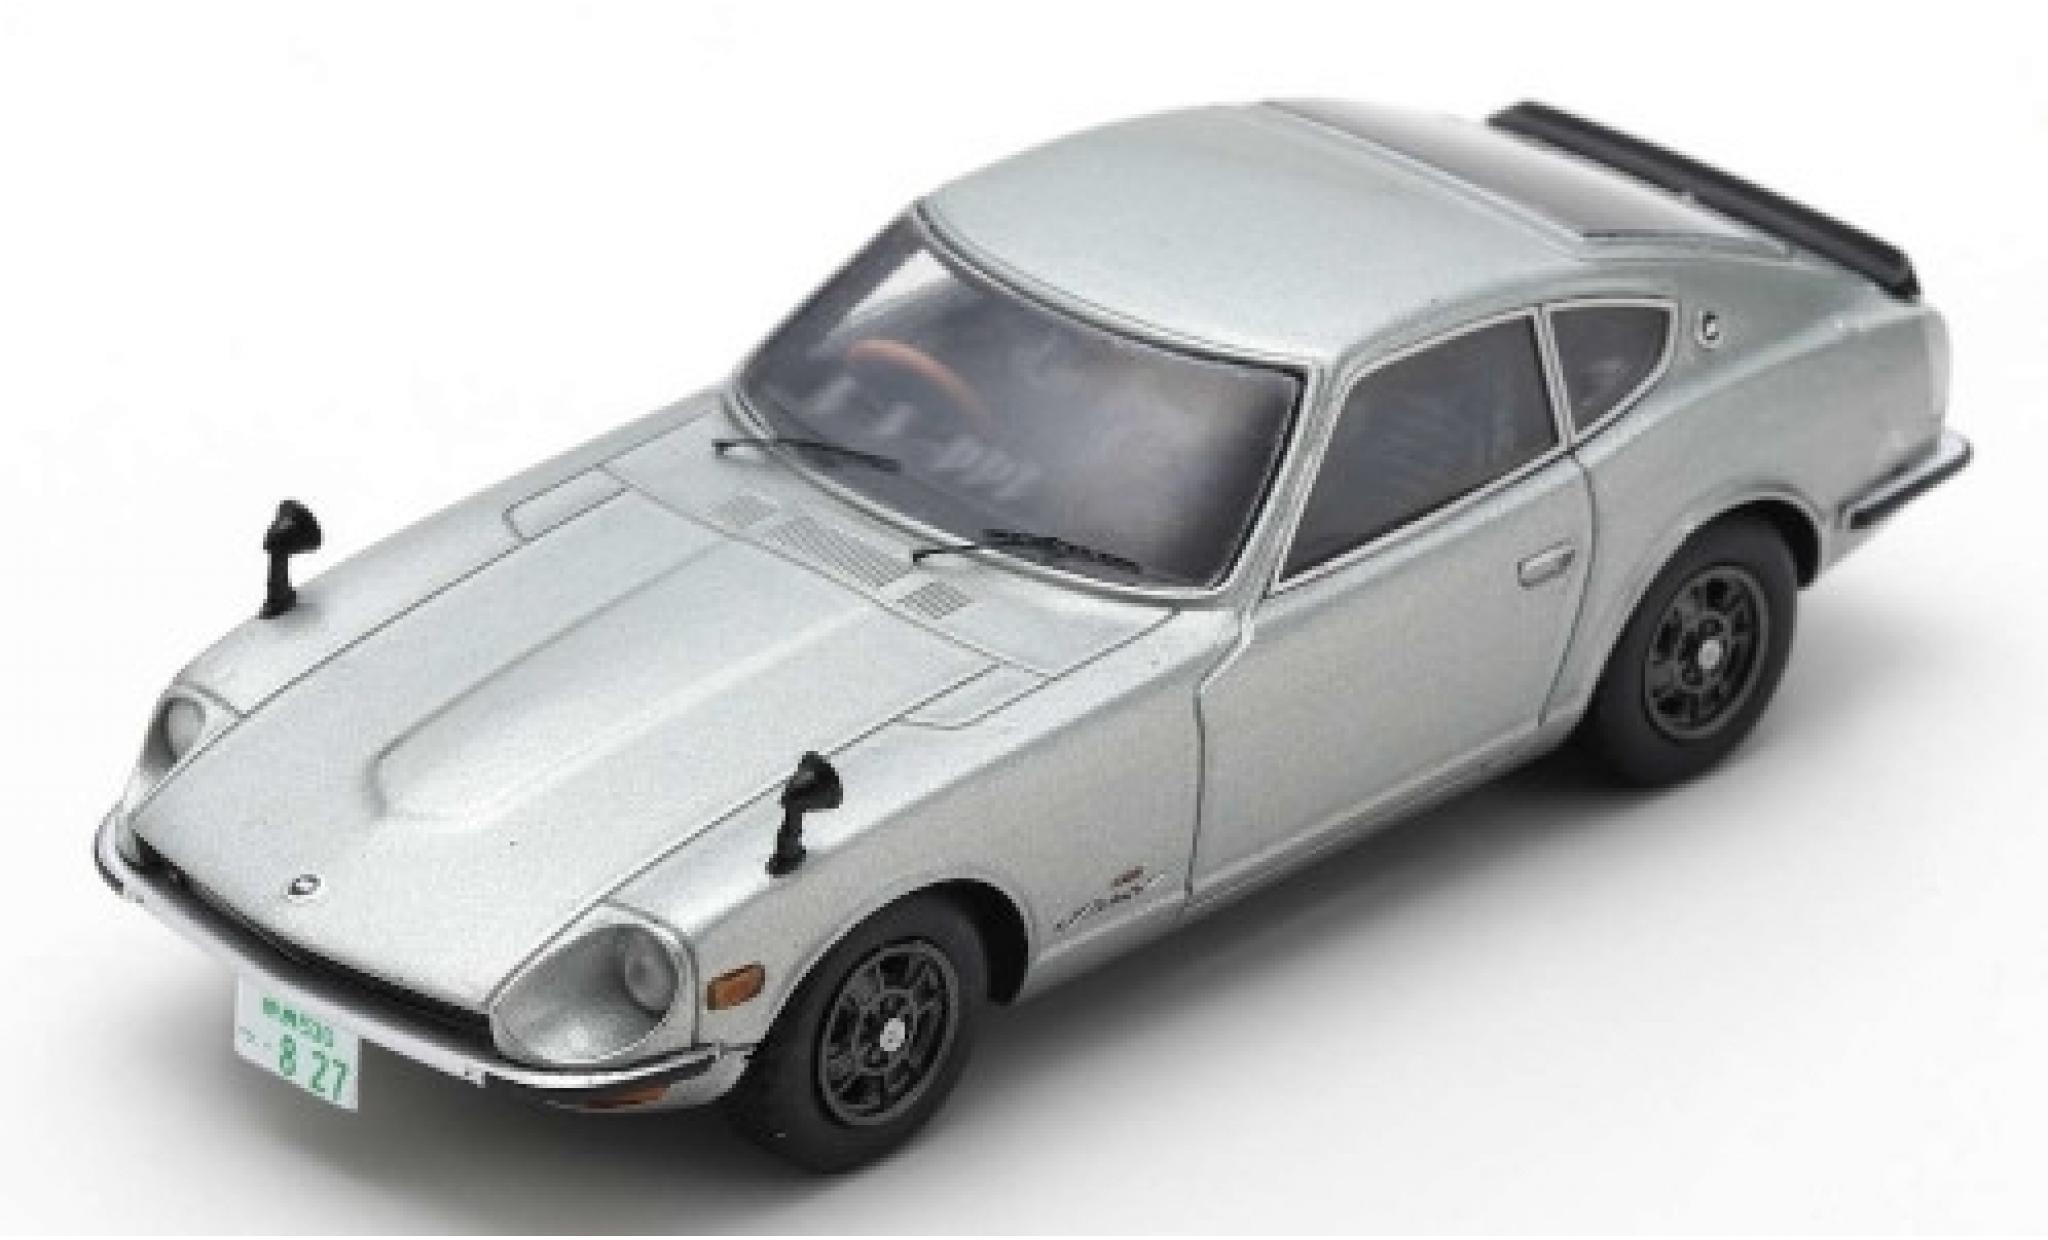 Nissan Fairlady Z 1/43 Spark 432 metallise grau RHD 1970